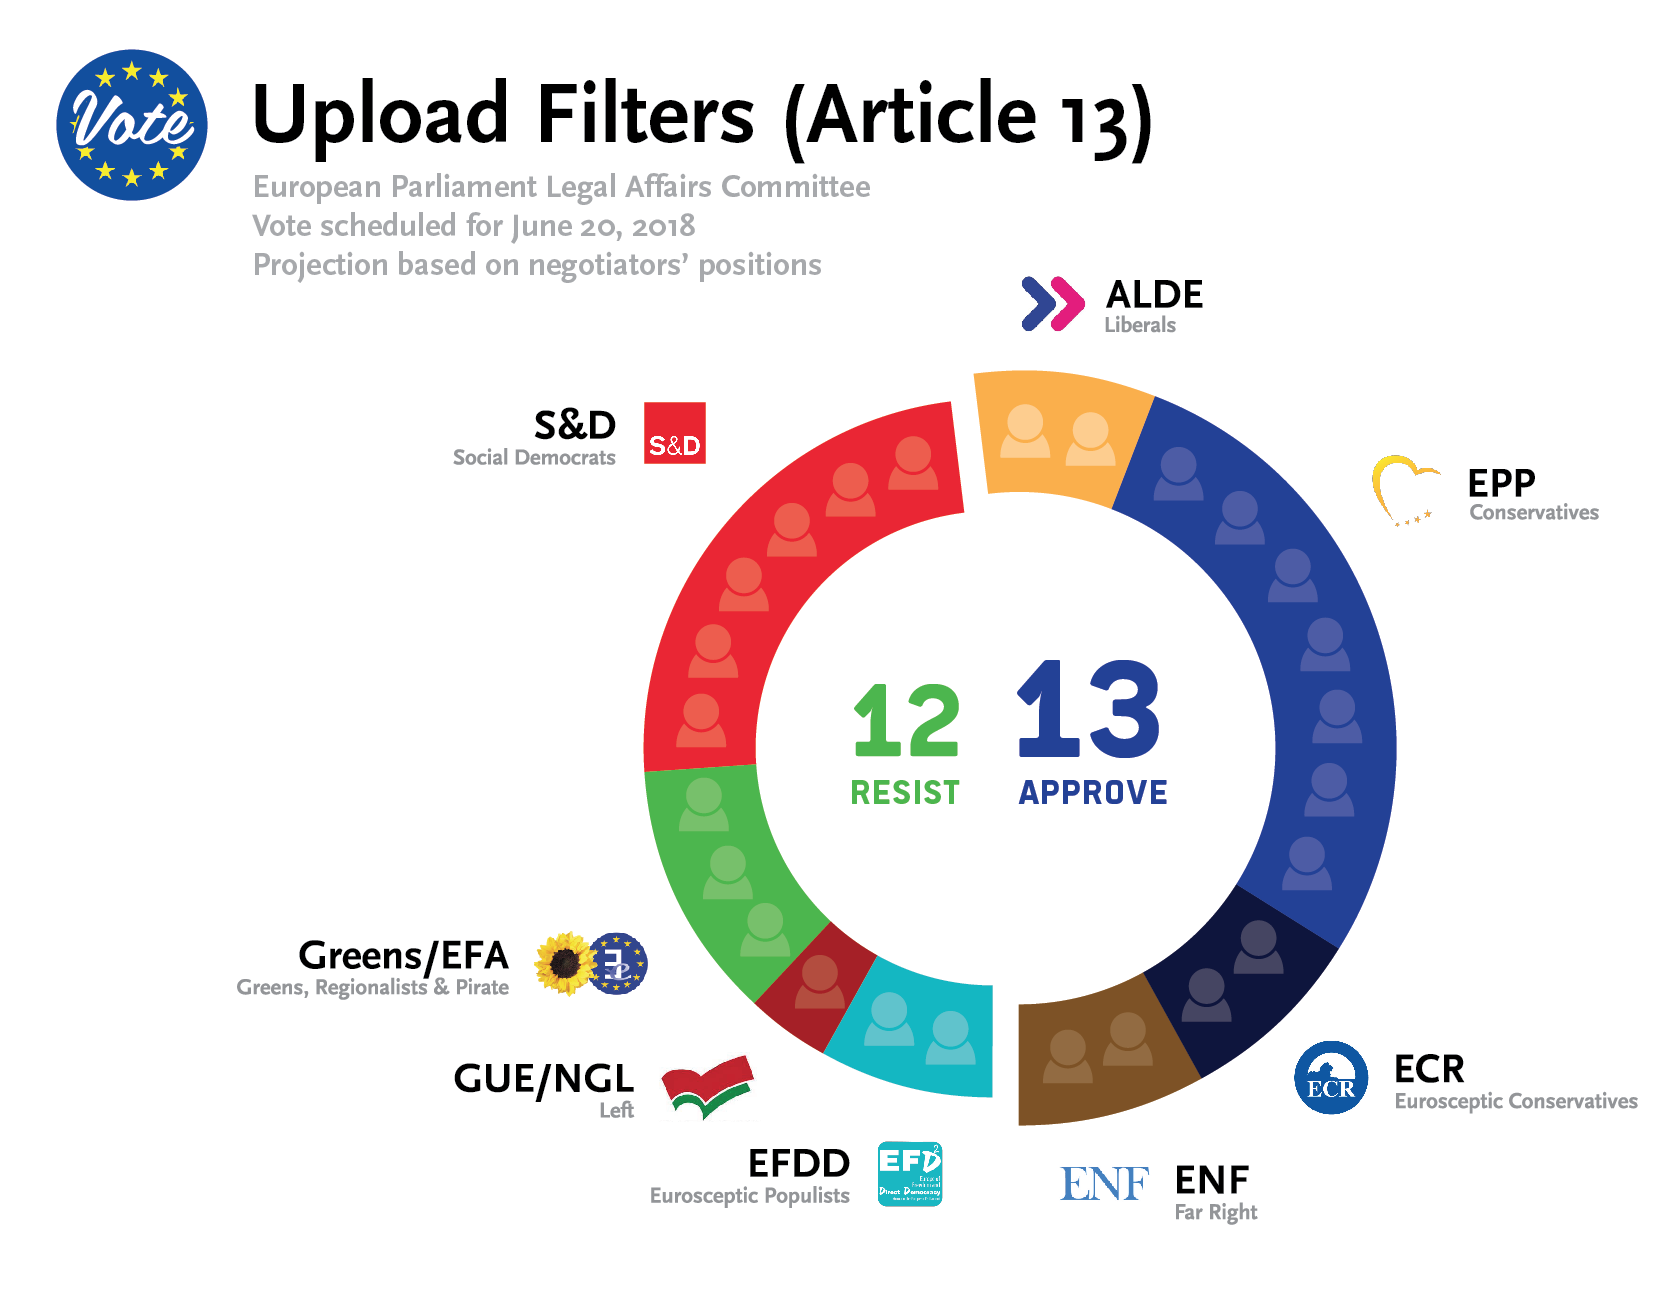 EU Copyright Artikel 13 Censuurmachine